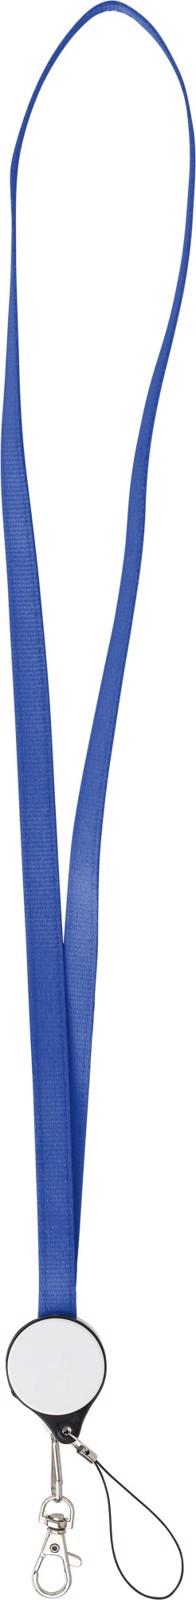 ABS 2-in-1 lanyard - Cobalt Blue